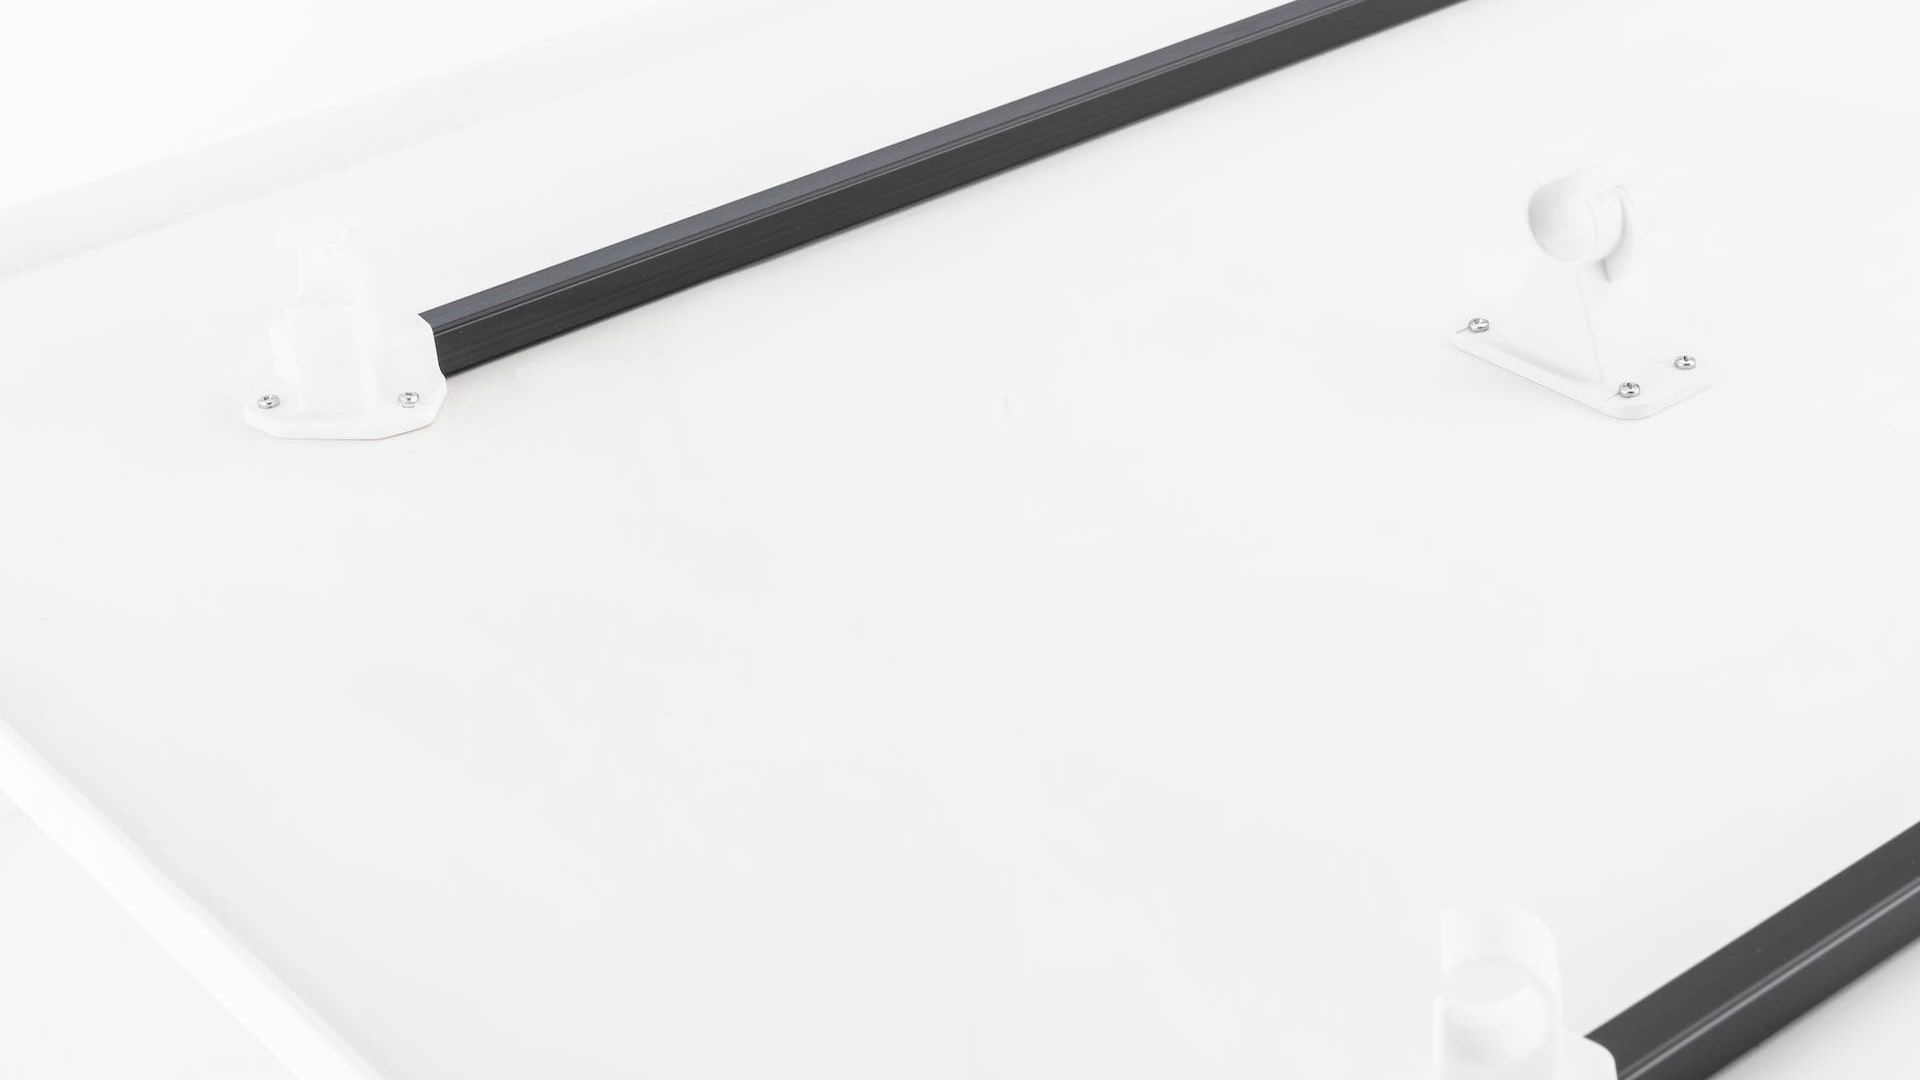 BOULEVARD KETTALUX-PLUS Klapptisch 140 x 95 cm